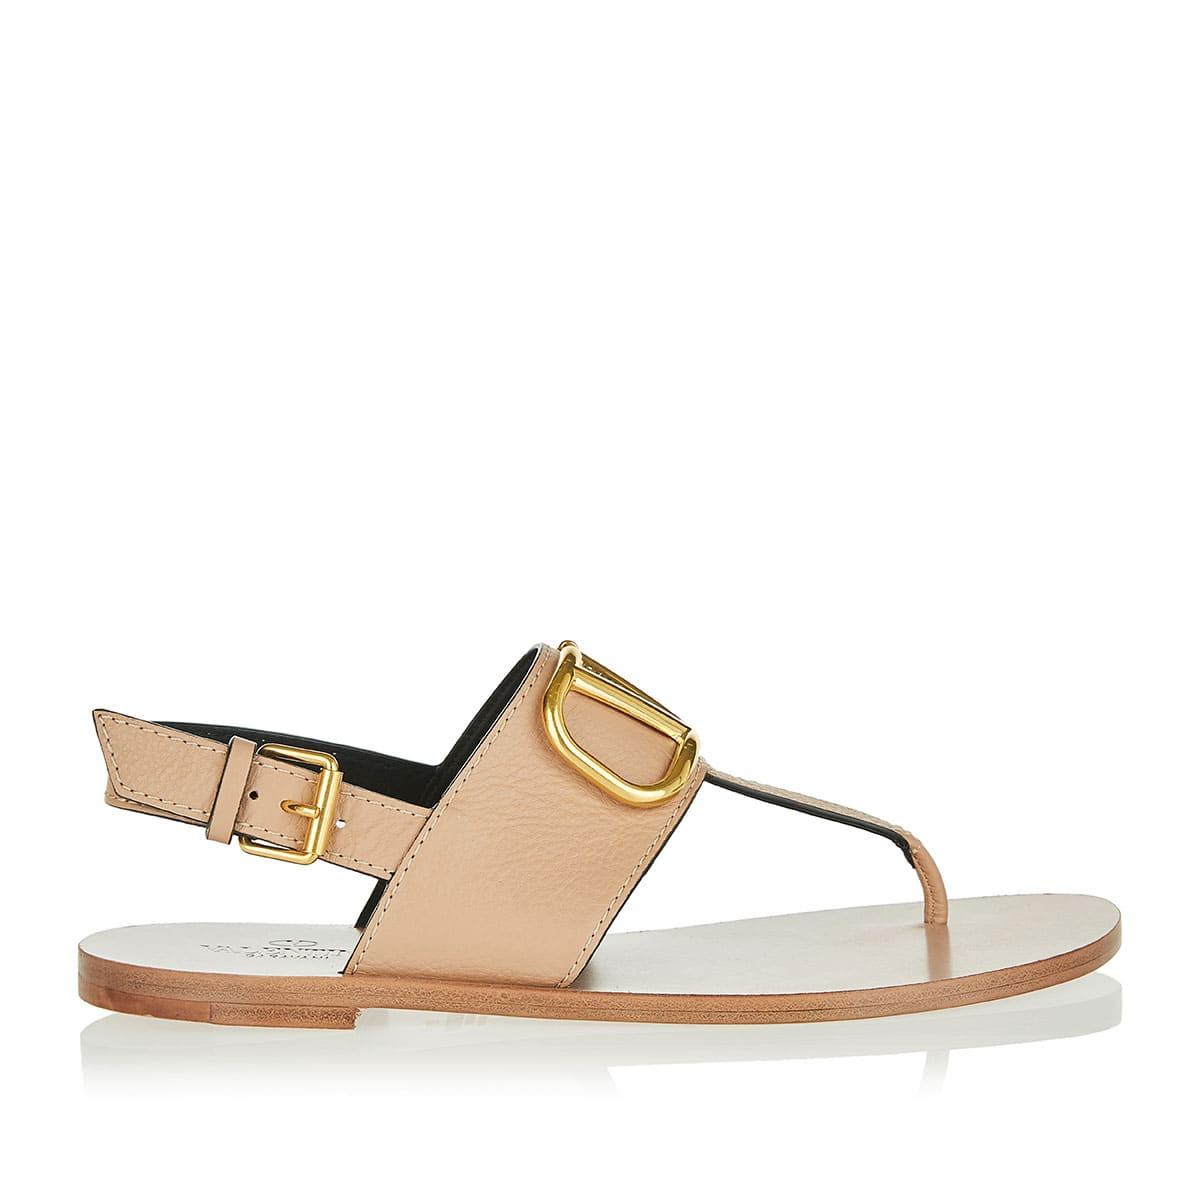 VLOGO Cowhide Flip Flop sandals